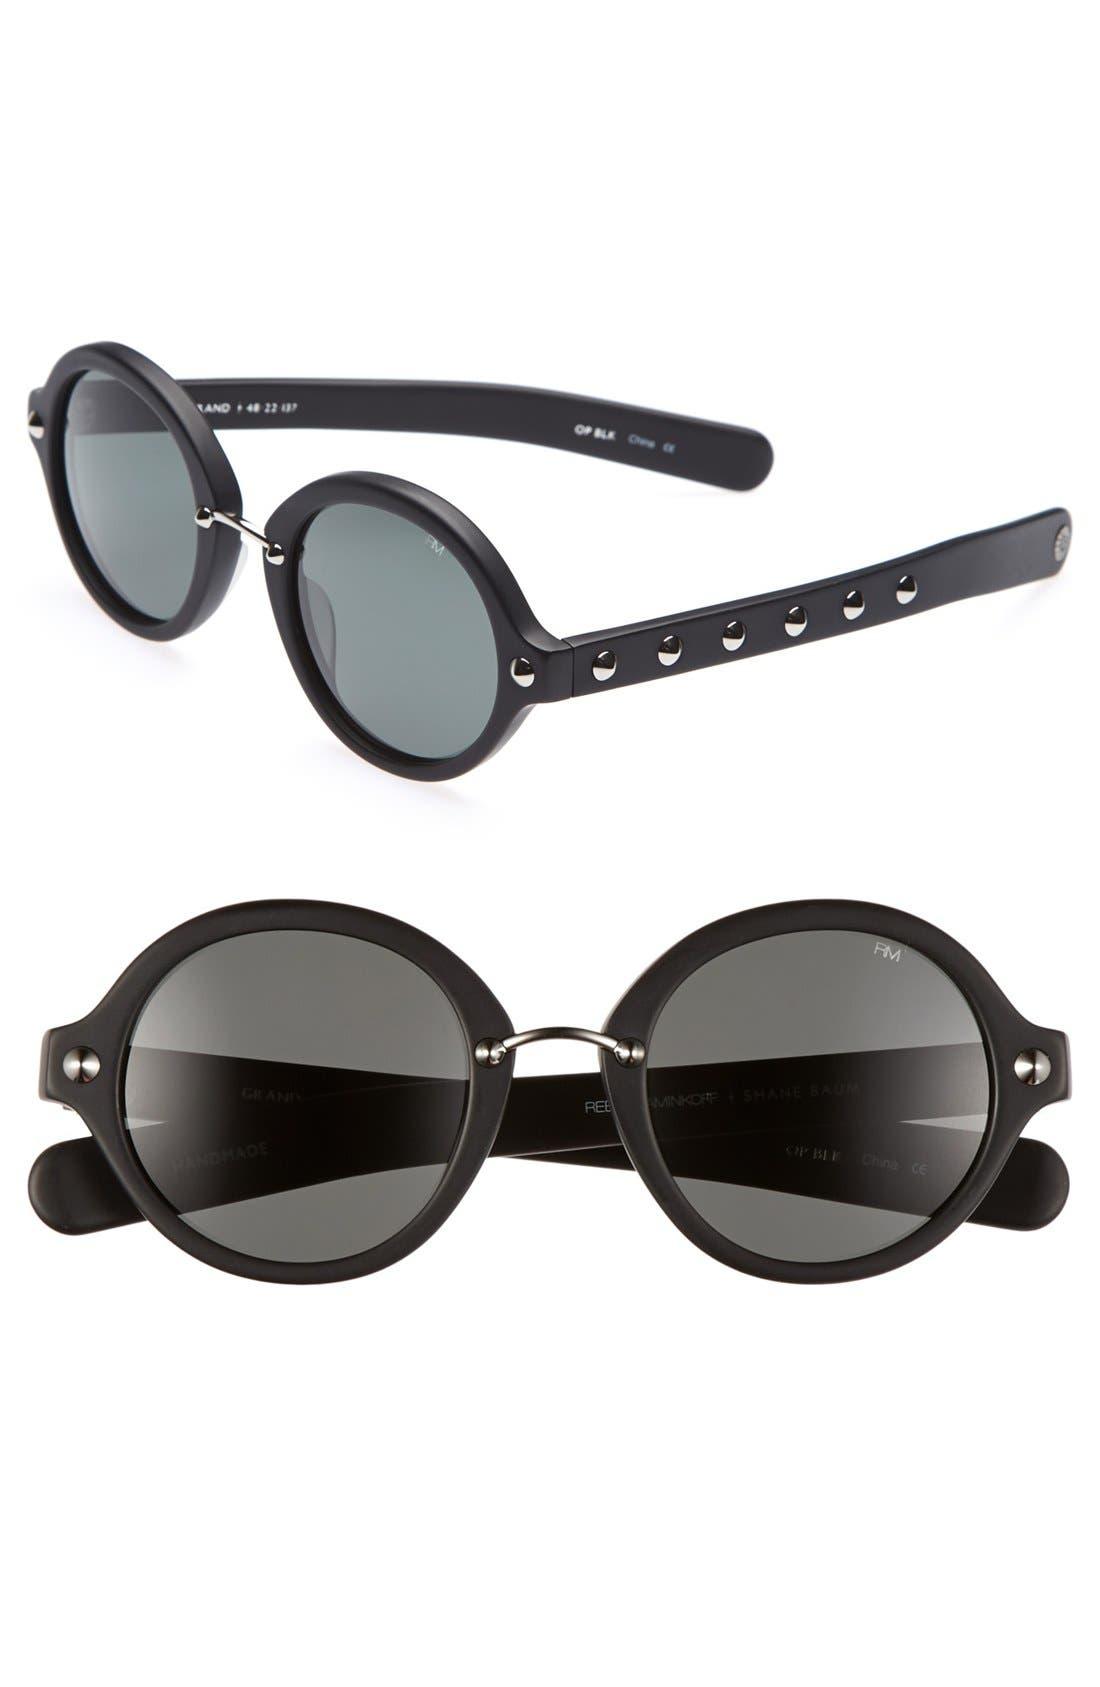 Main Image - Rebecca Minkoff 'Grand' 48mm Sunglasses